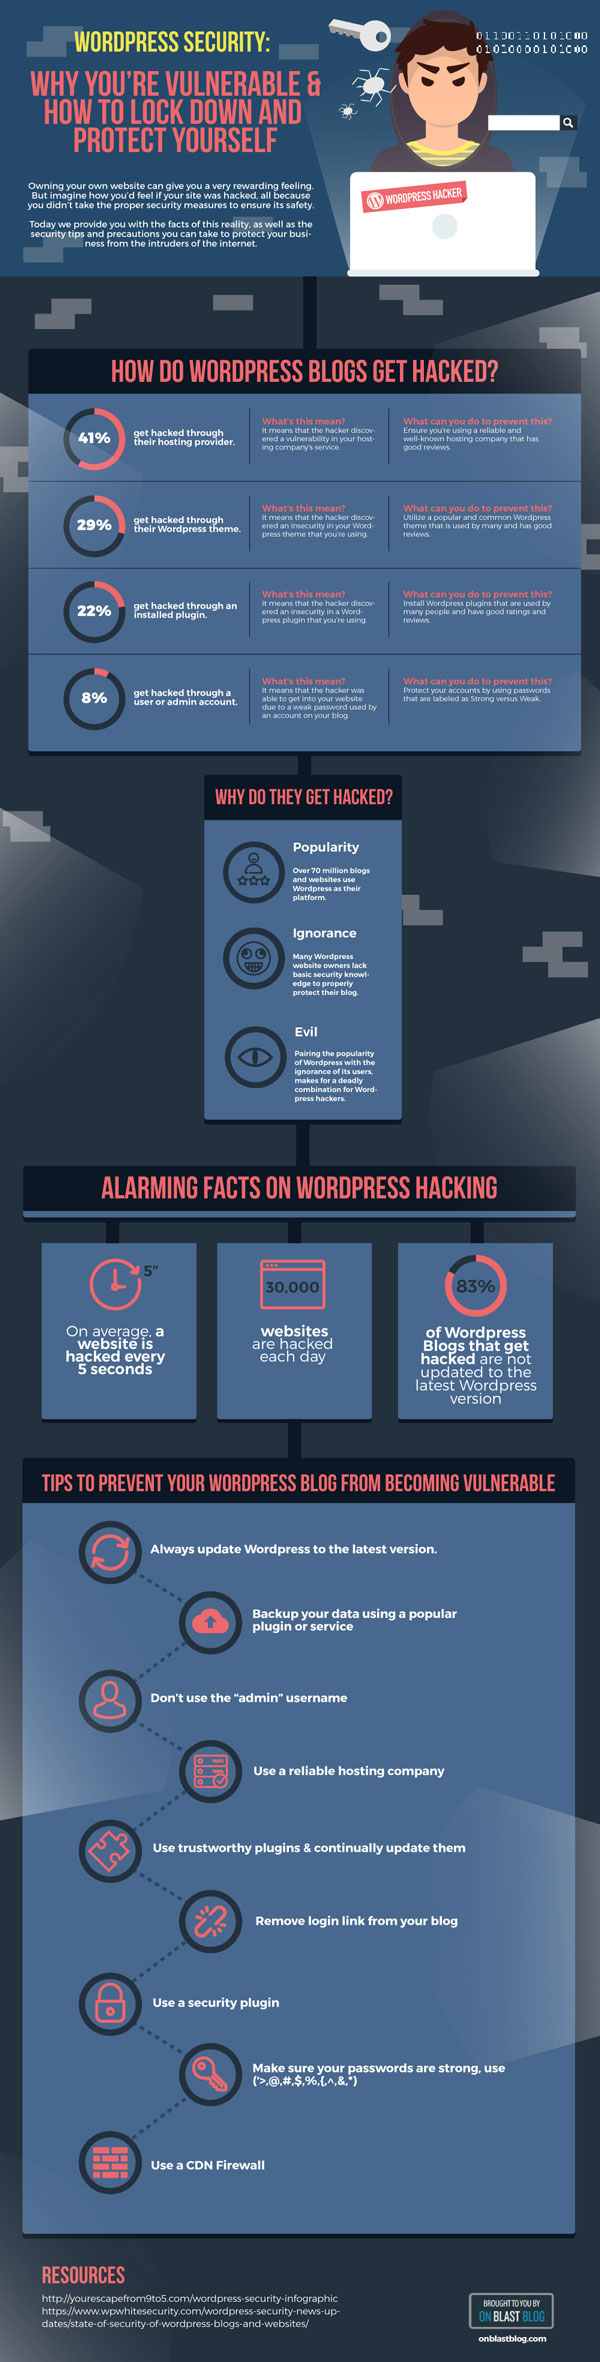 WordPress-Security-Guide